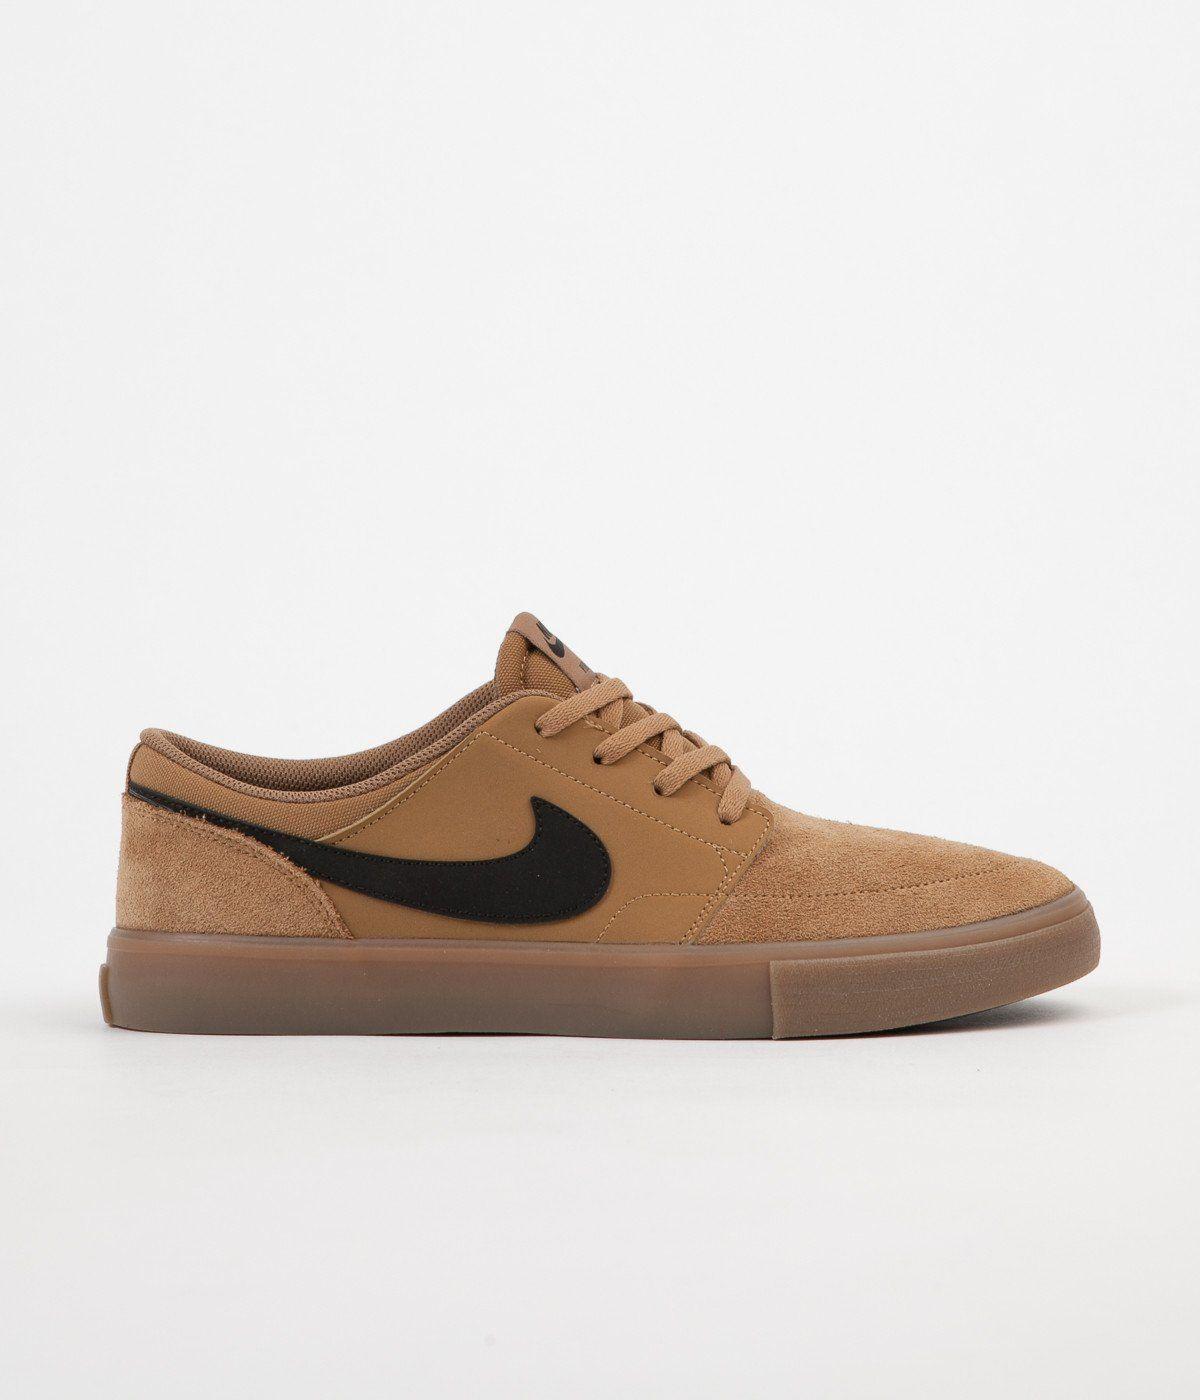 Nike SB SOLARSOFT PORTMORE II - Trainers - black/light brown/dark grey fAvqQNow